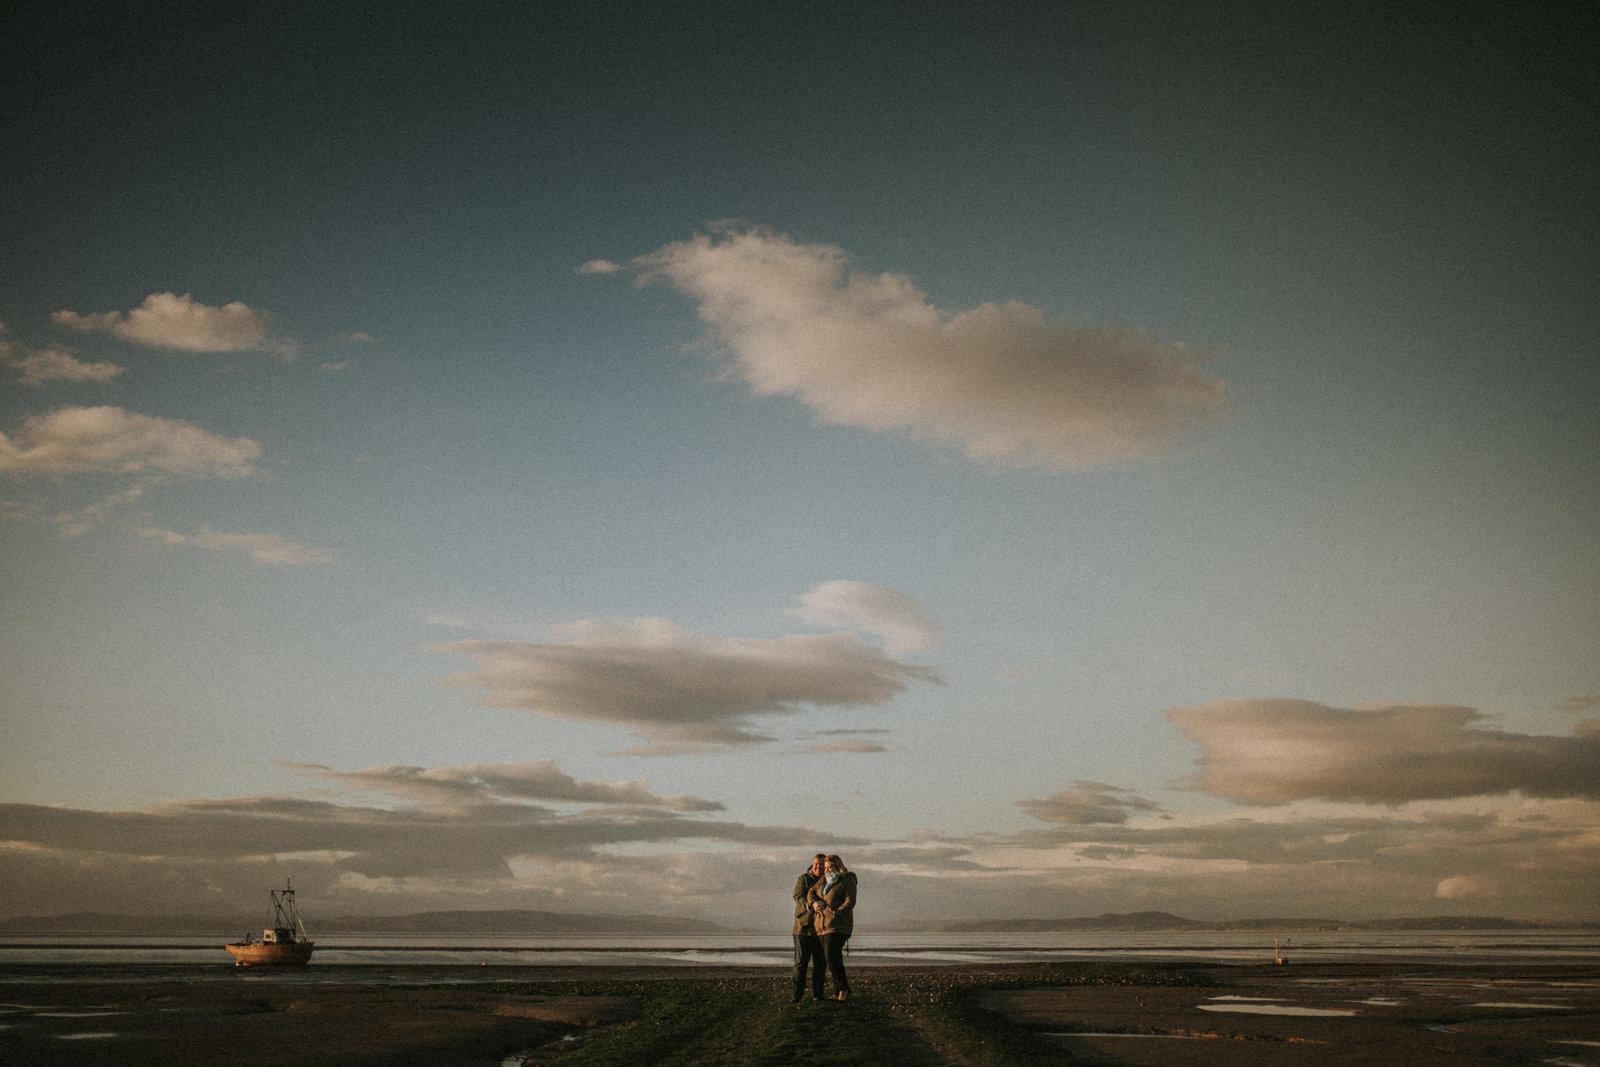 Cumbria Wedding Photographer Jono Symonds captures newly engaged couple with a backdrop of Morecambe Bay